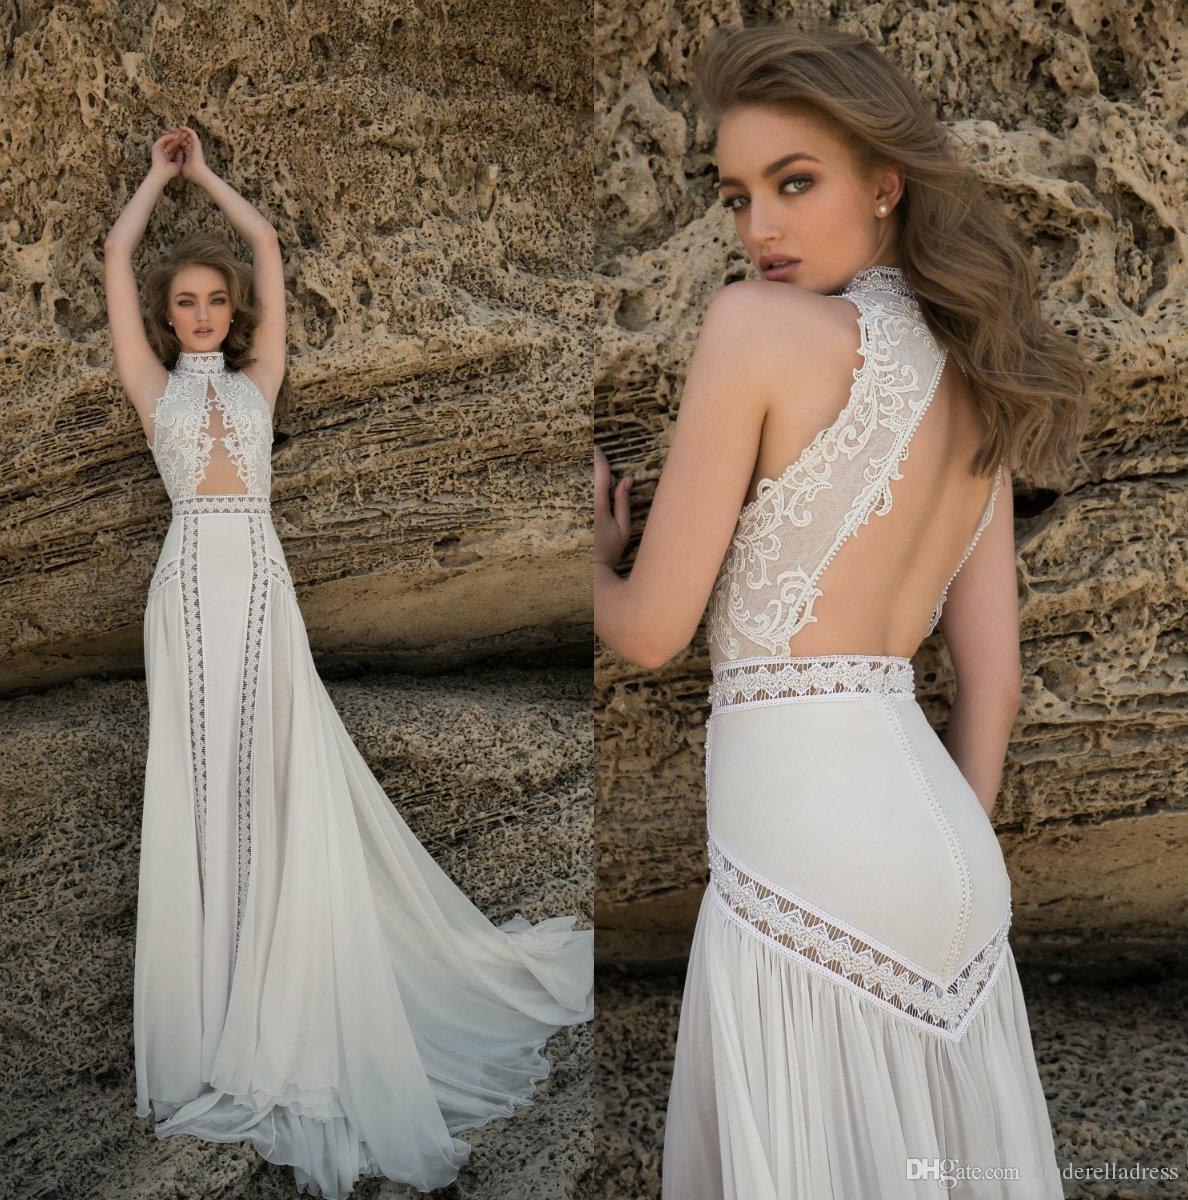 Country Style Hollow Beach Wedding Dresses abiti da sposa High Neck Backless Bridal Gown A Line Plus Size Wedding Dress